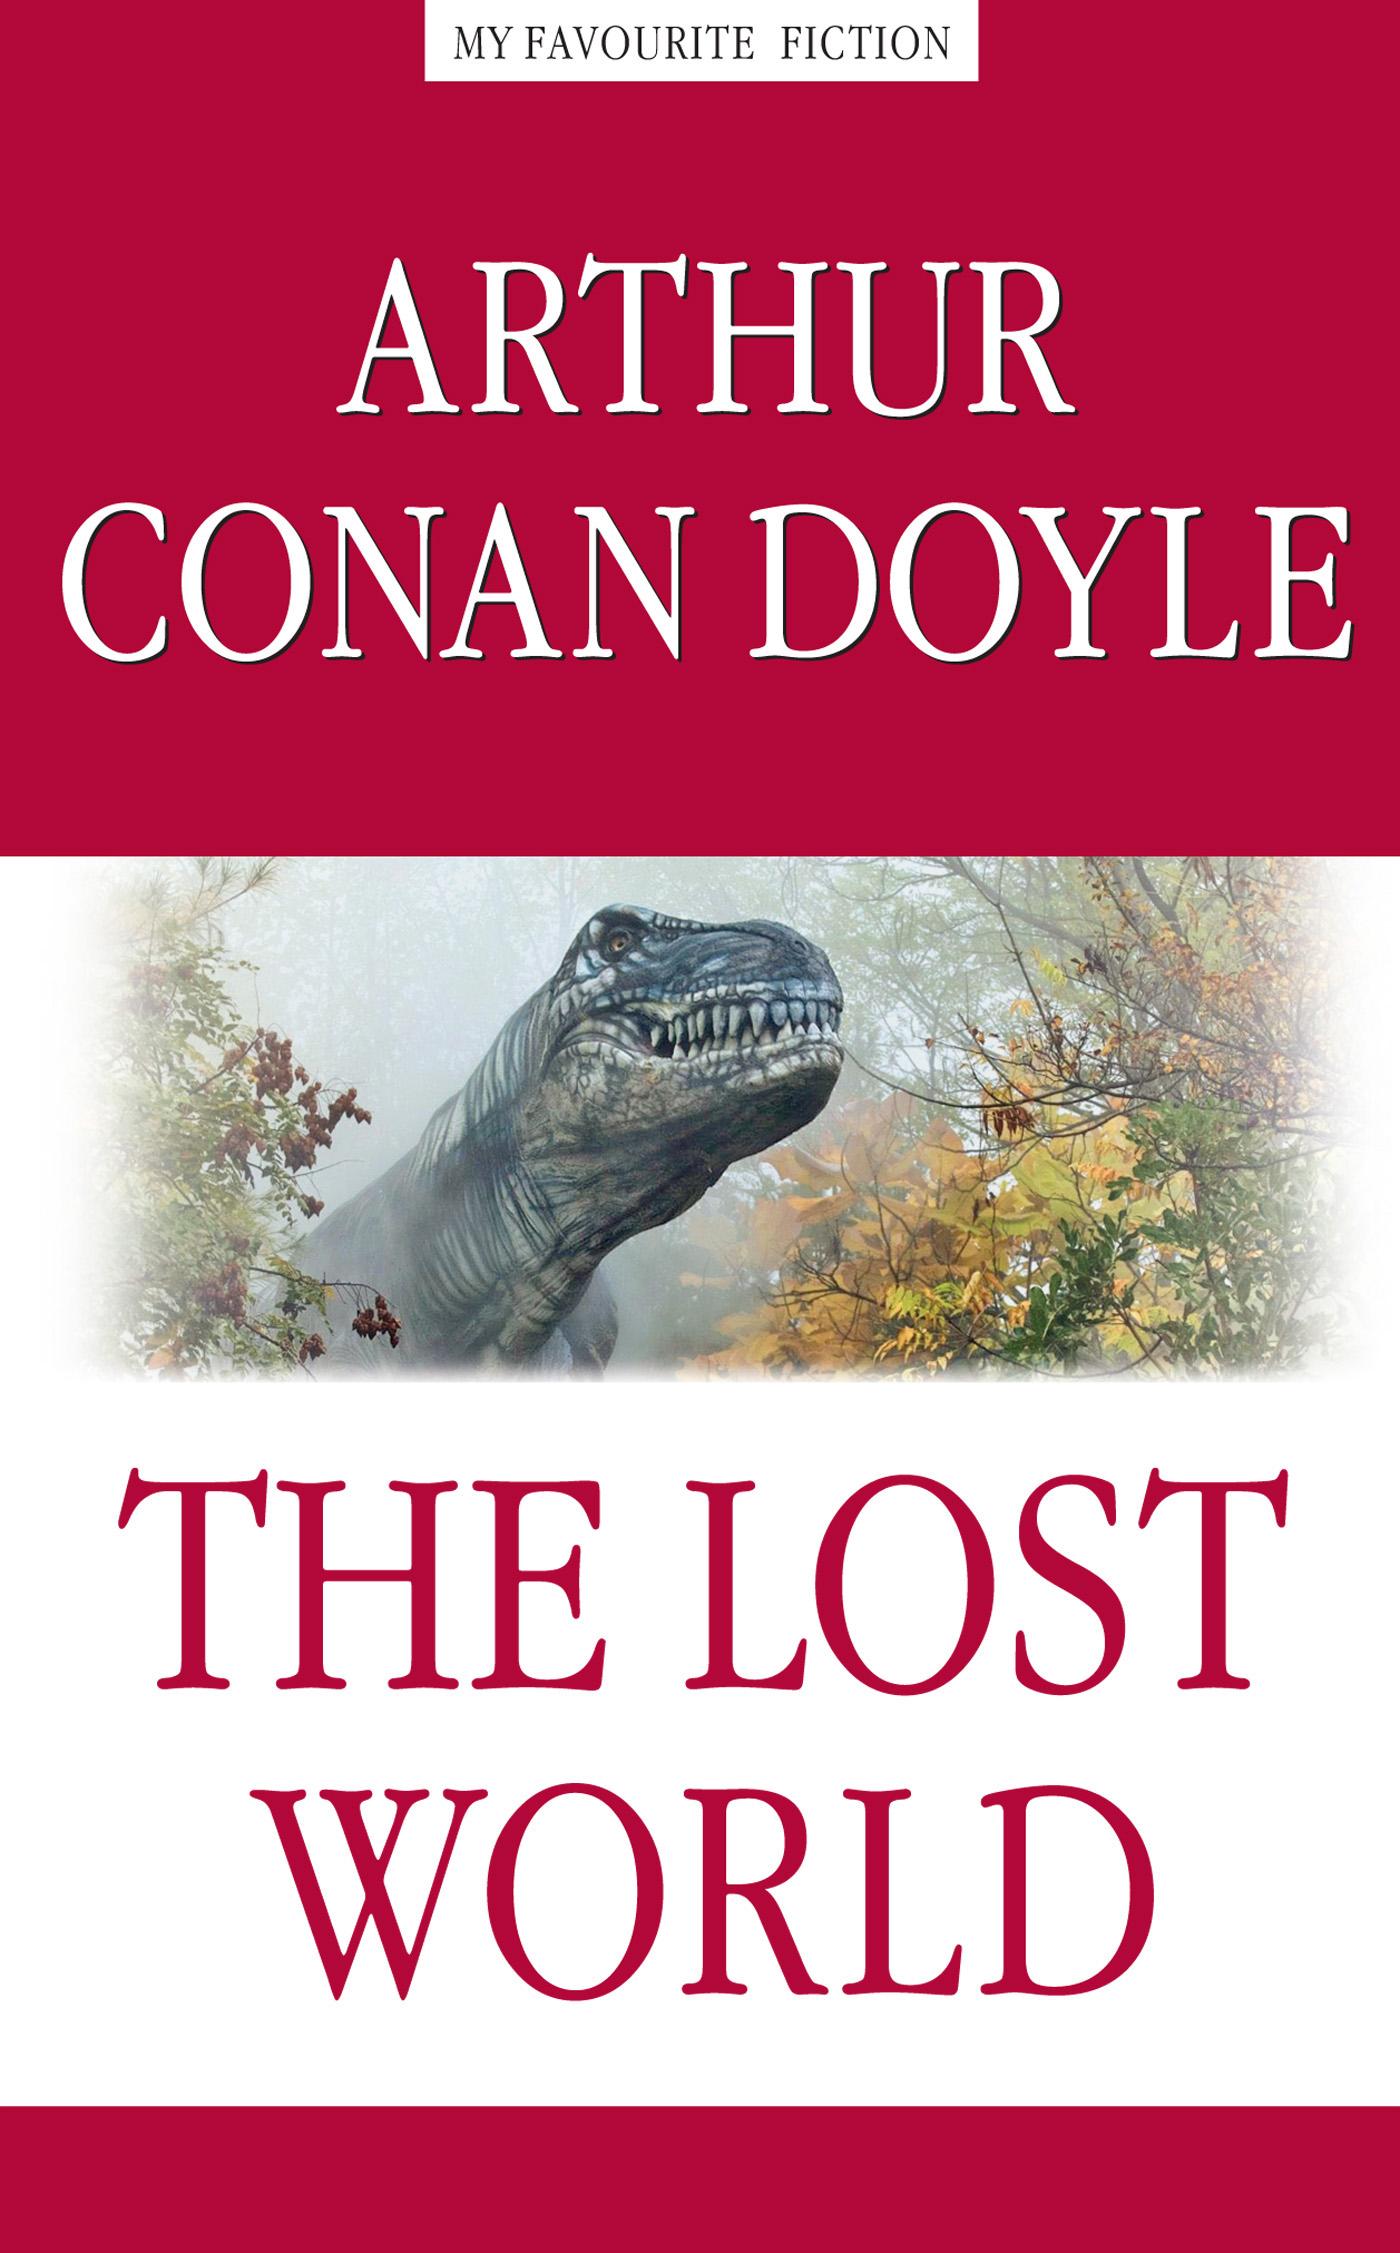 Артур Конан Дойл The Lost World / Затерянный мир дойль а затерянный мир the lost world 3 уровень упражнения ключи словари cd